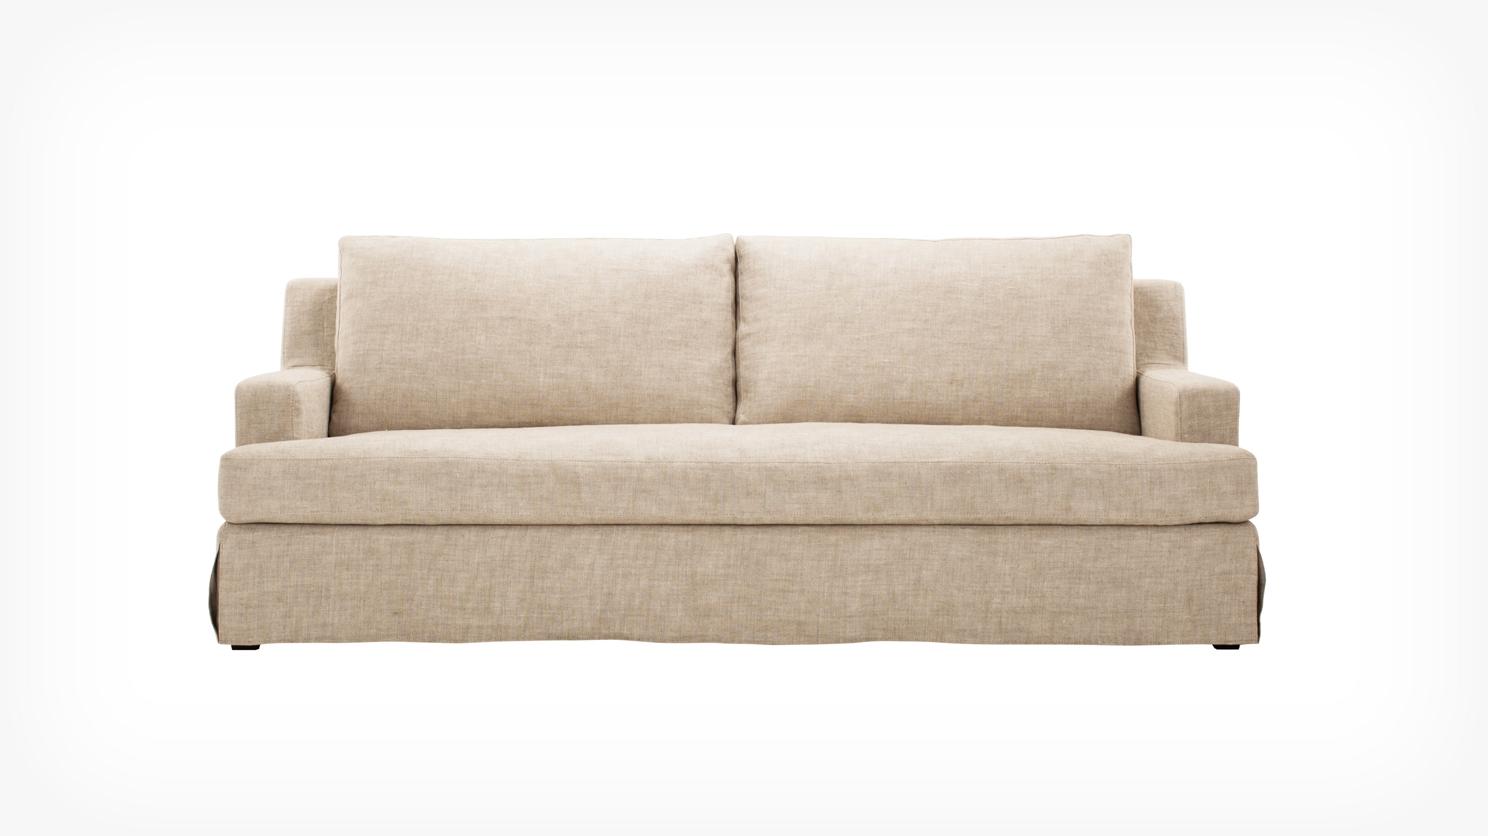 denim sofas uk alstons sofa bed reviews 12 best of contemporary slipcovers